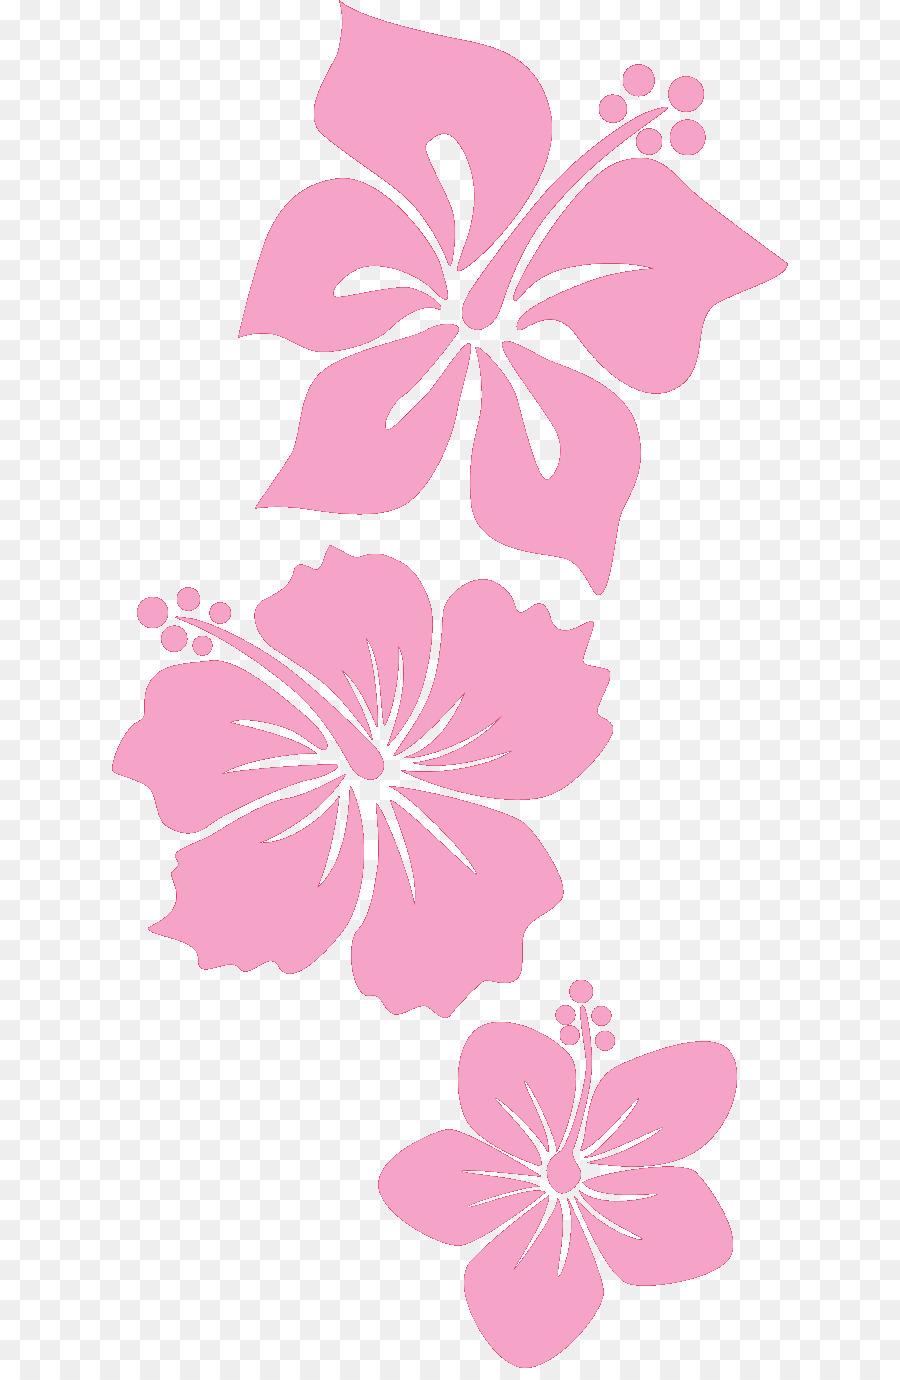 Descarga gratuita de Hibiscus Hawaiian, Rosa, Pétalo Imágen de Png